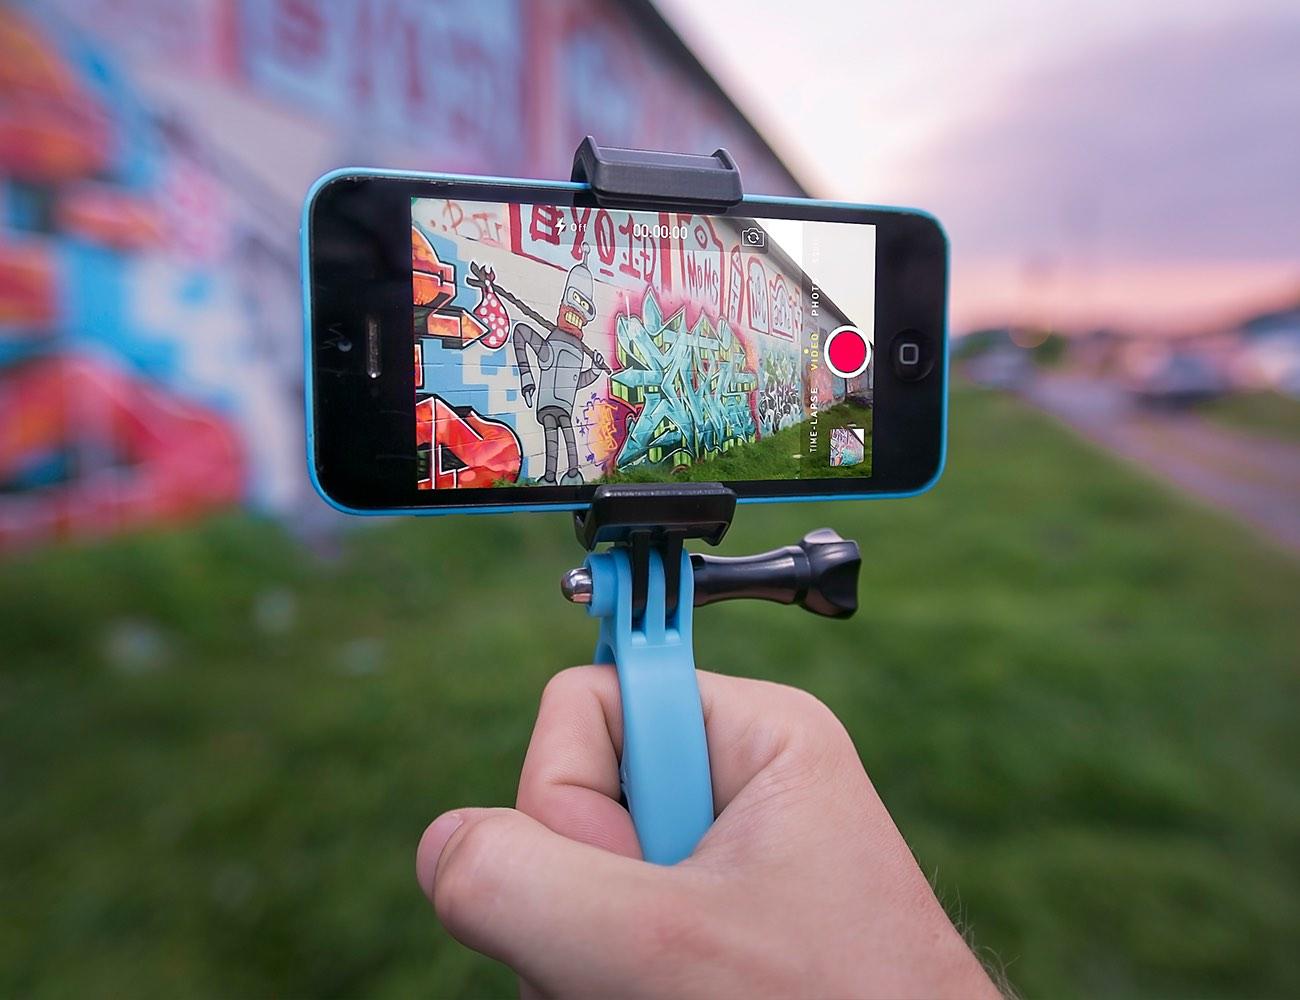 FreeRide+Smartphone+Mount+By+GoWorx%C2%AE